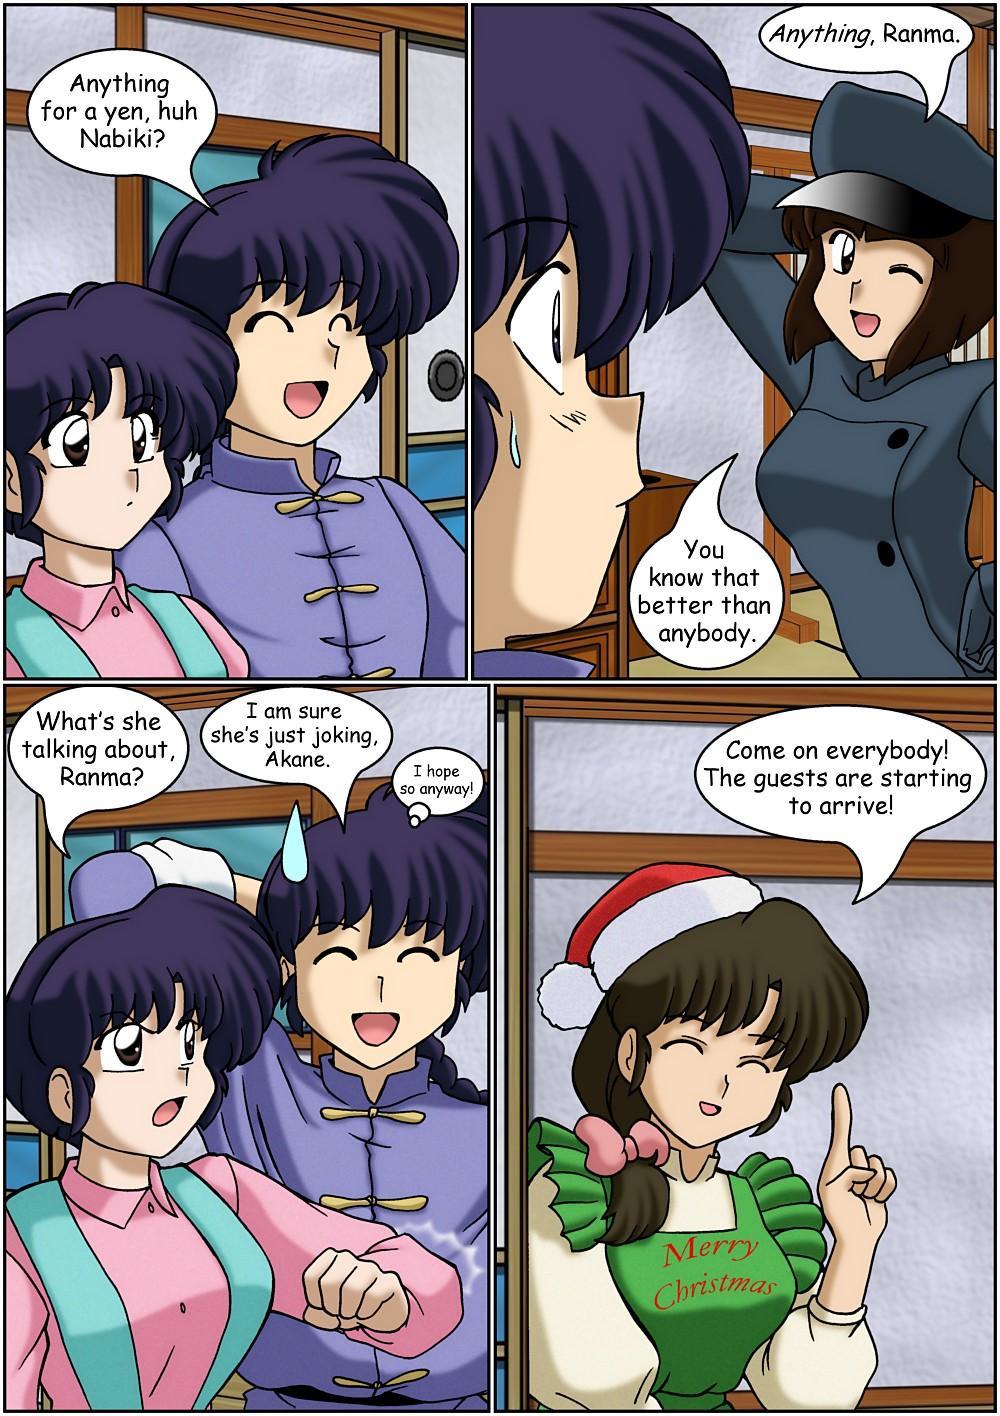 A Ranma Christmas Story